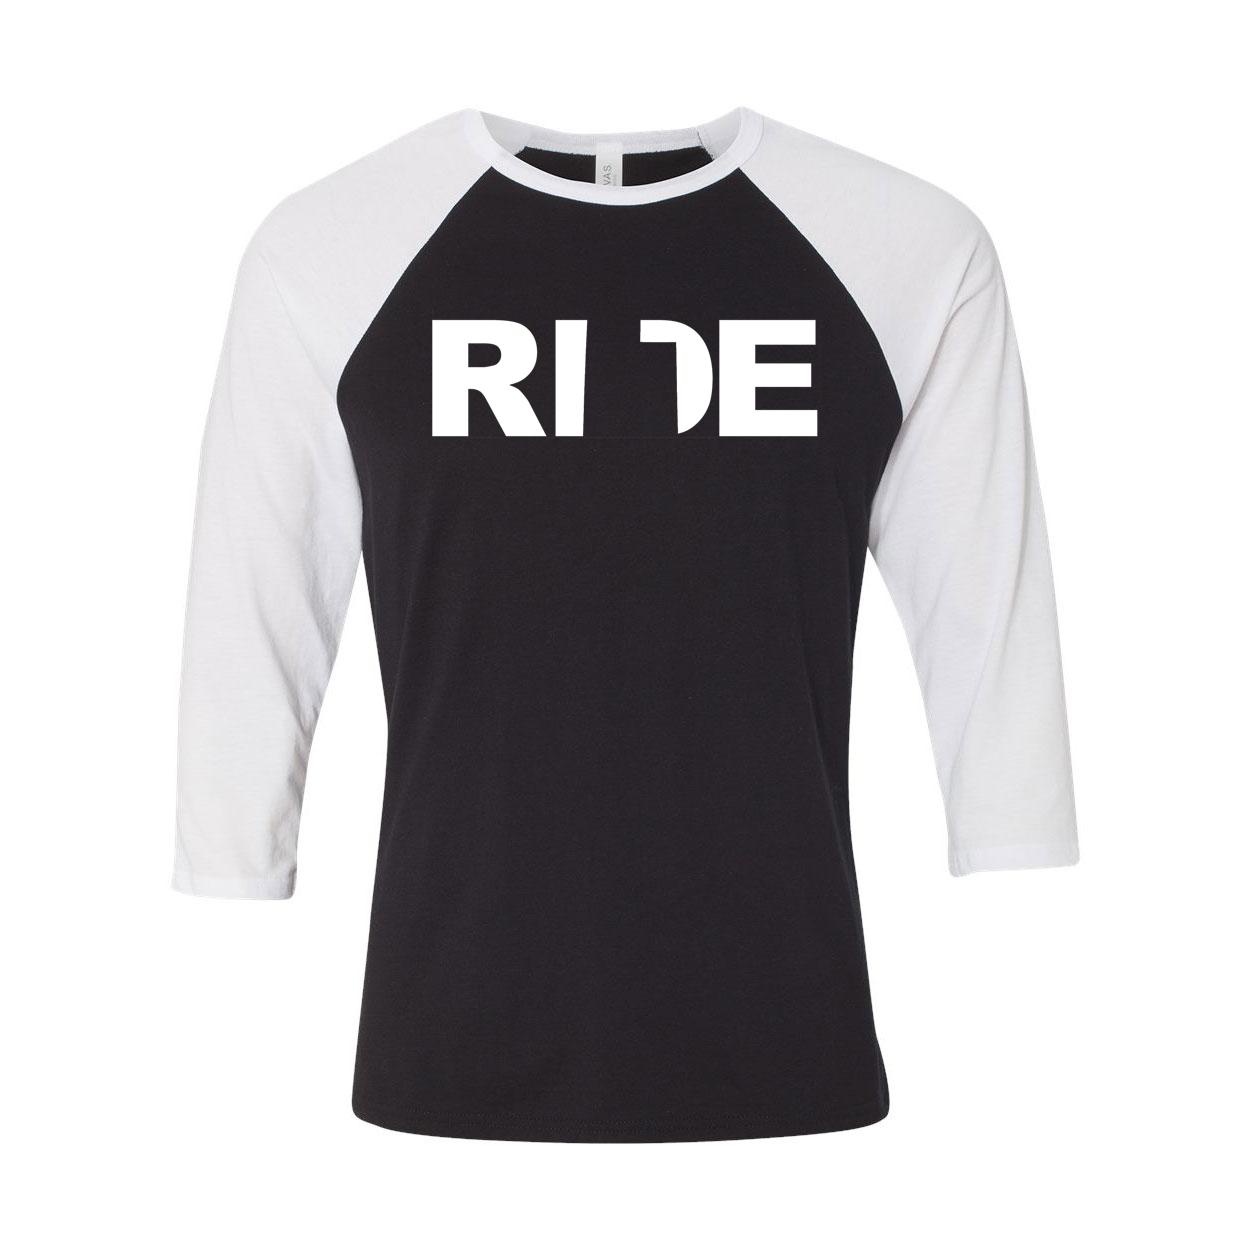 Ride Utah Classic Raglan Shirt Black/White (White Logo)